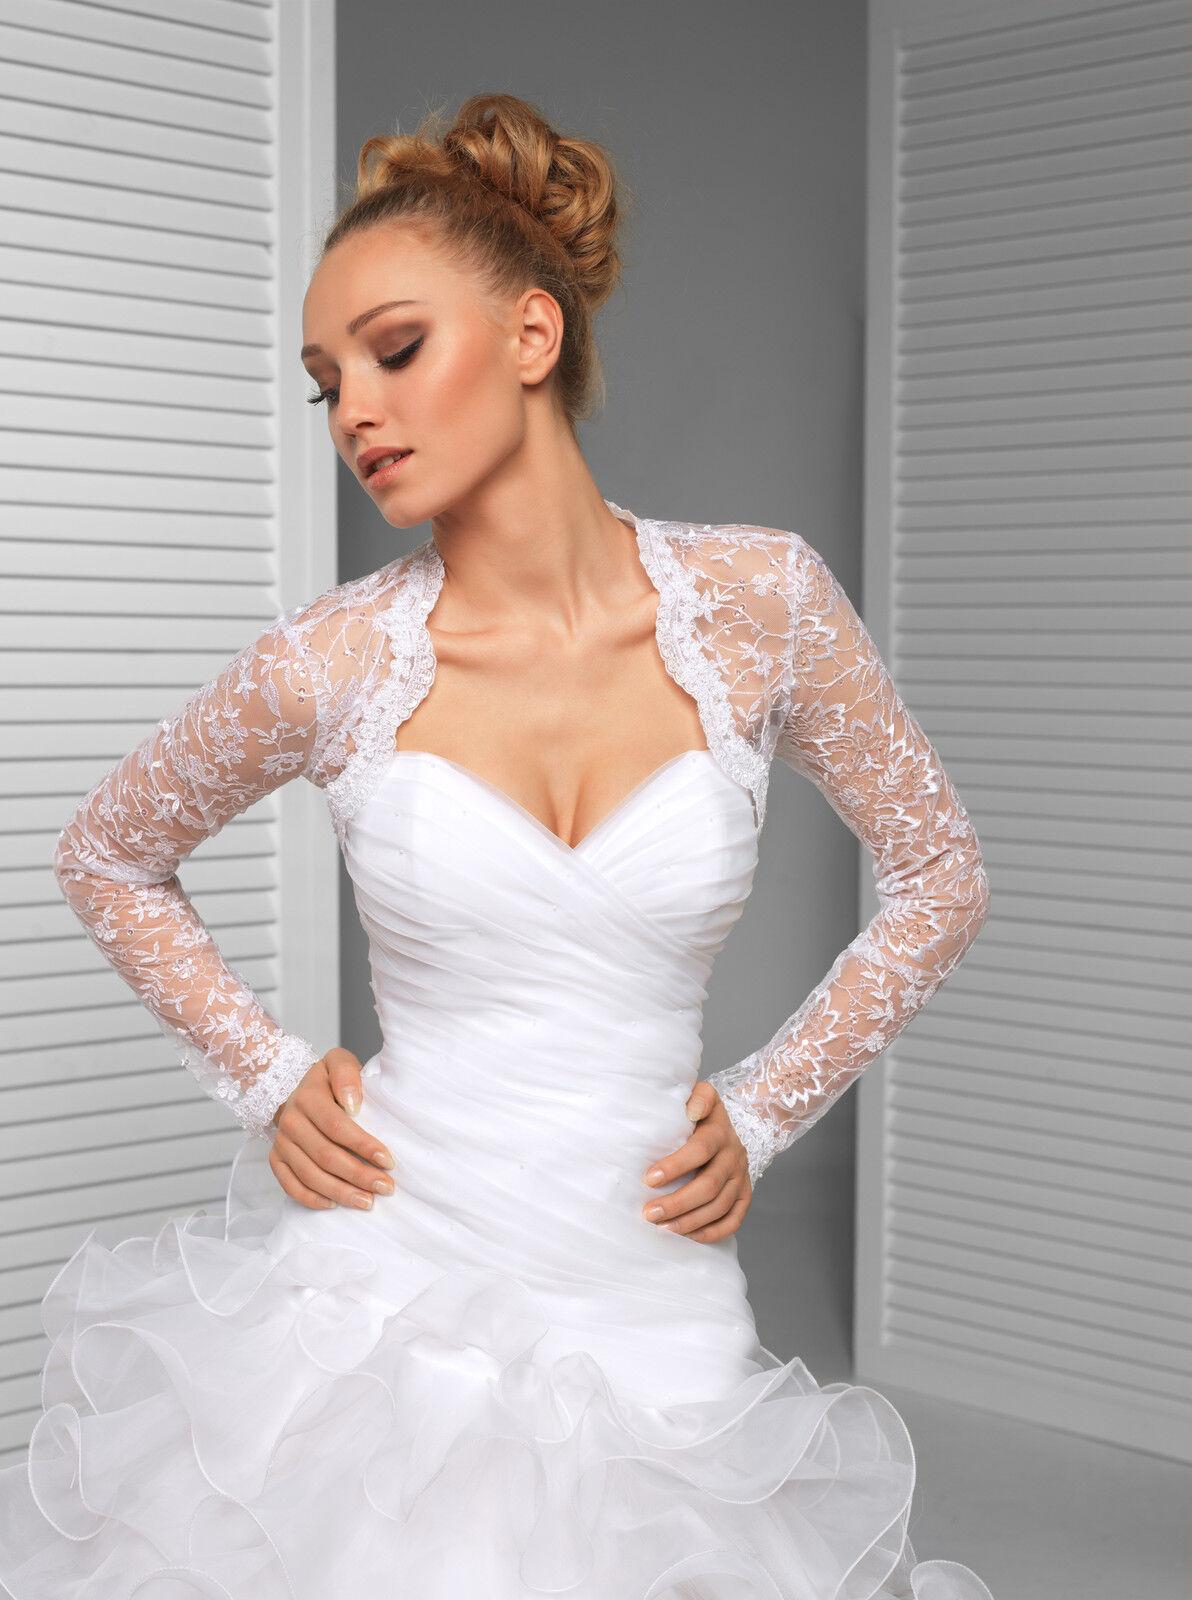 7420359e1c Womens Wedding New Top Bridal Lace Bolero Shrug Jacket Long Sleeve S M L XL  XXL